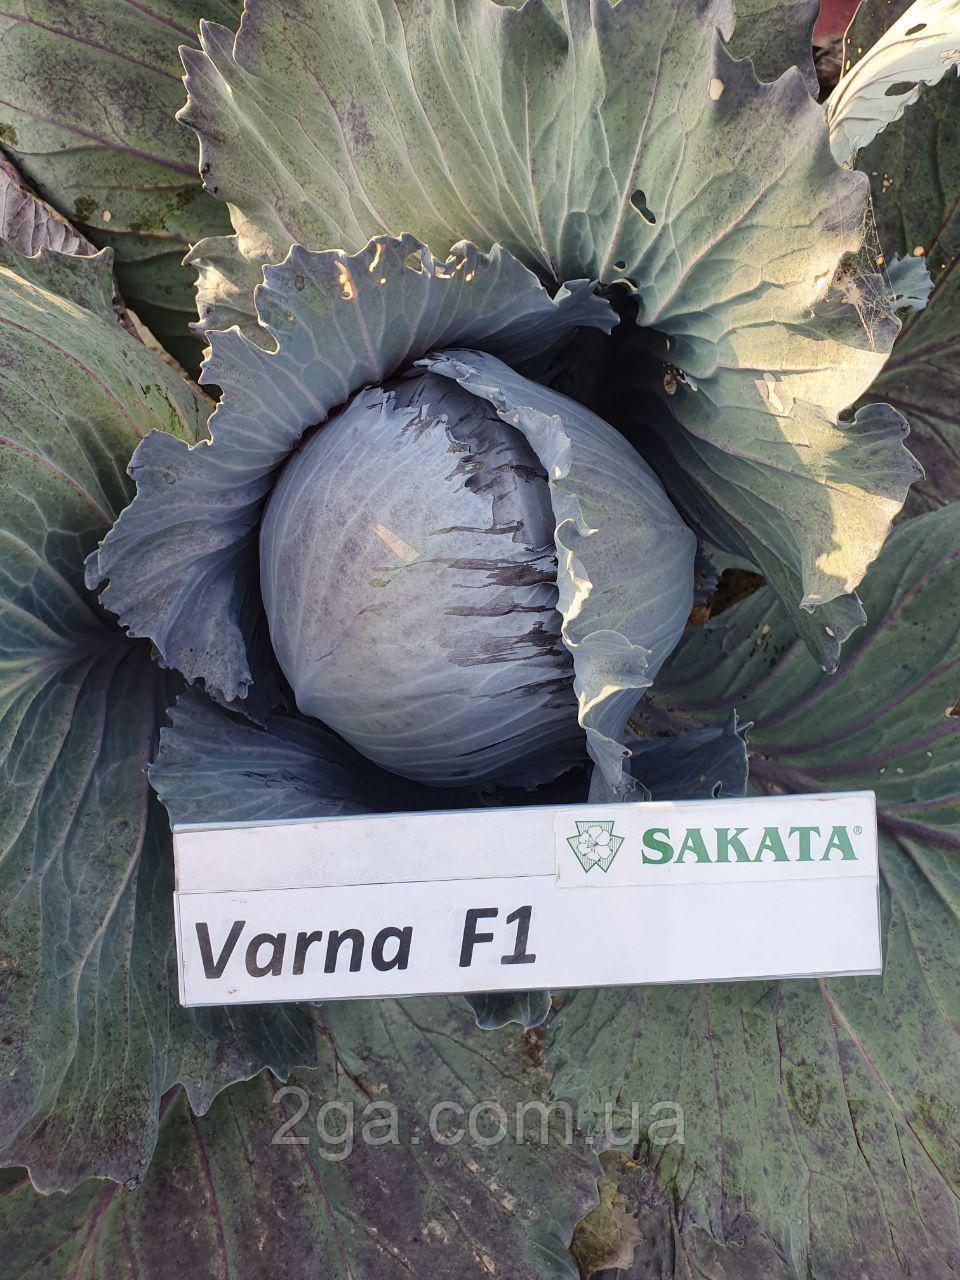 Варна F1 / Varna F1 - Капуста краснокочанная, Sakata. 1000 семян